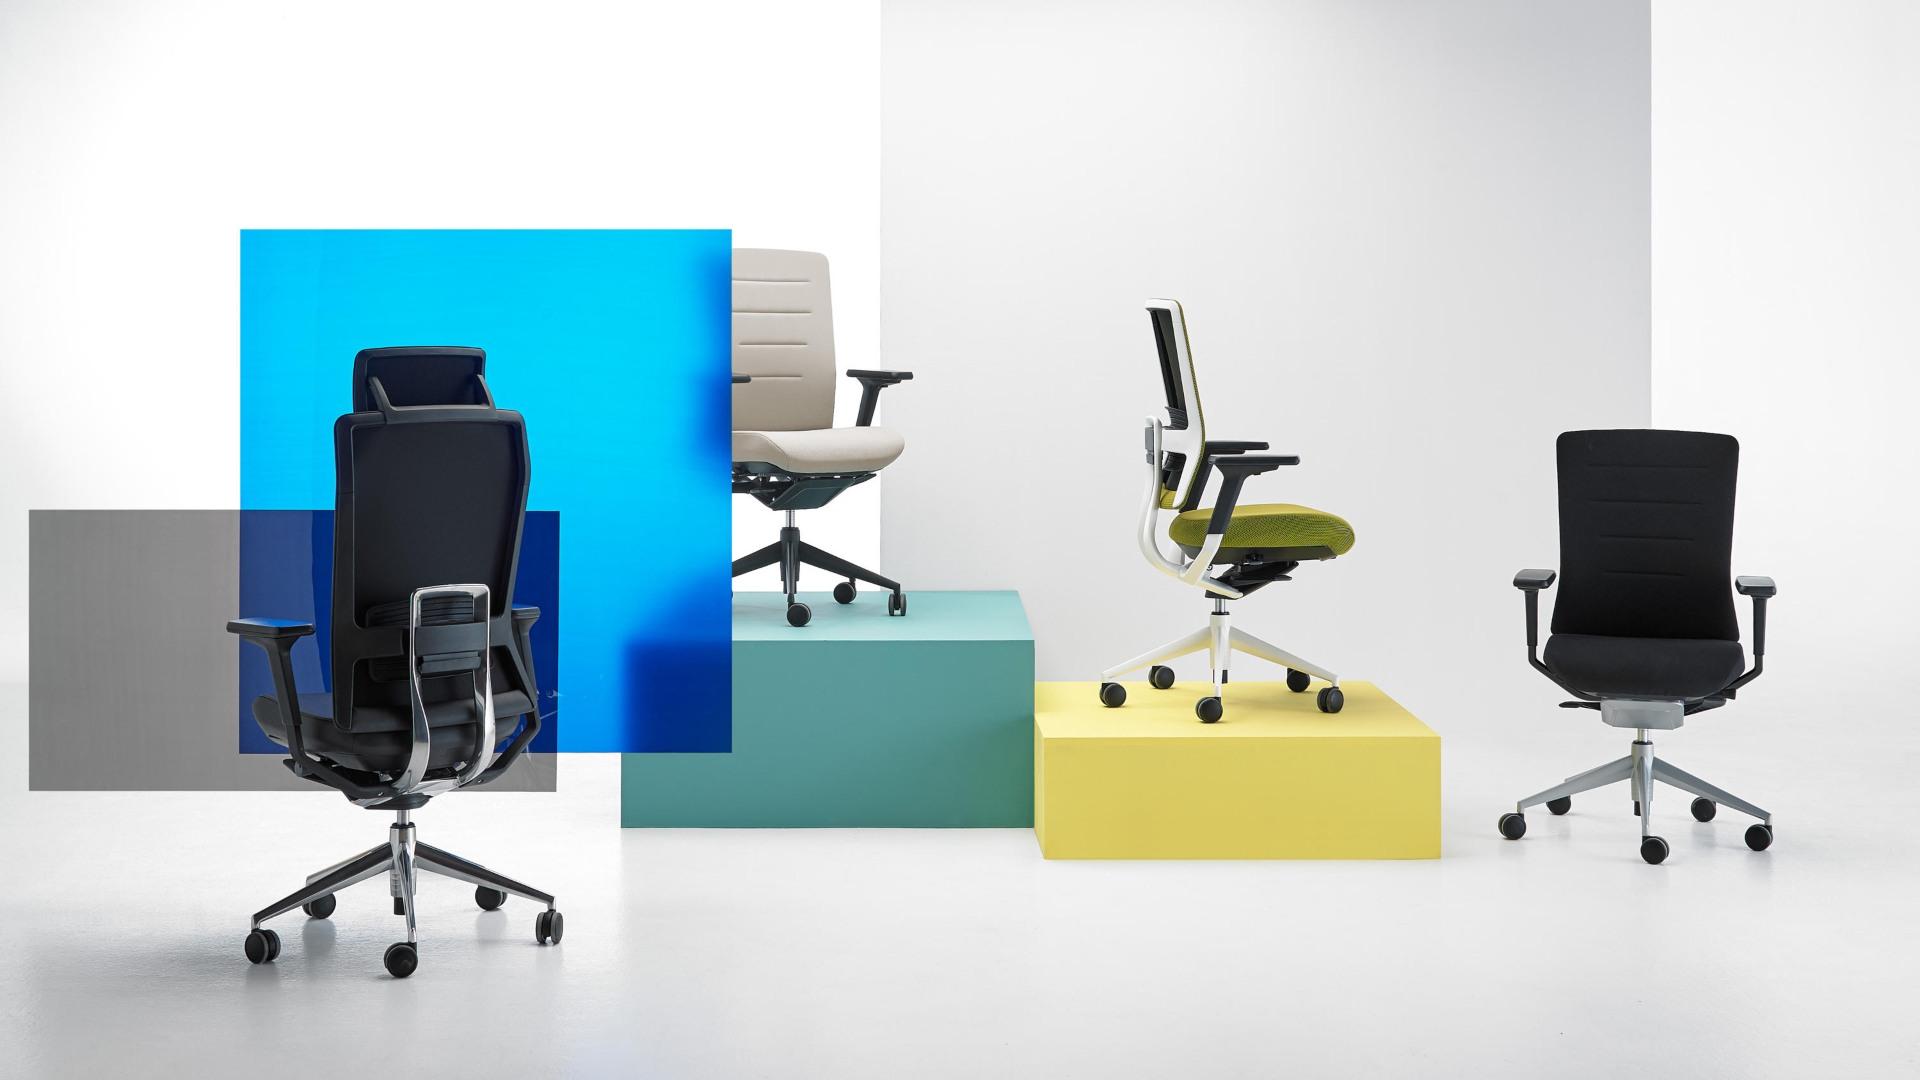 sillas ergonomicas actiu